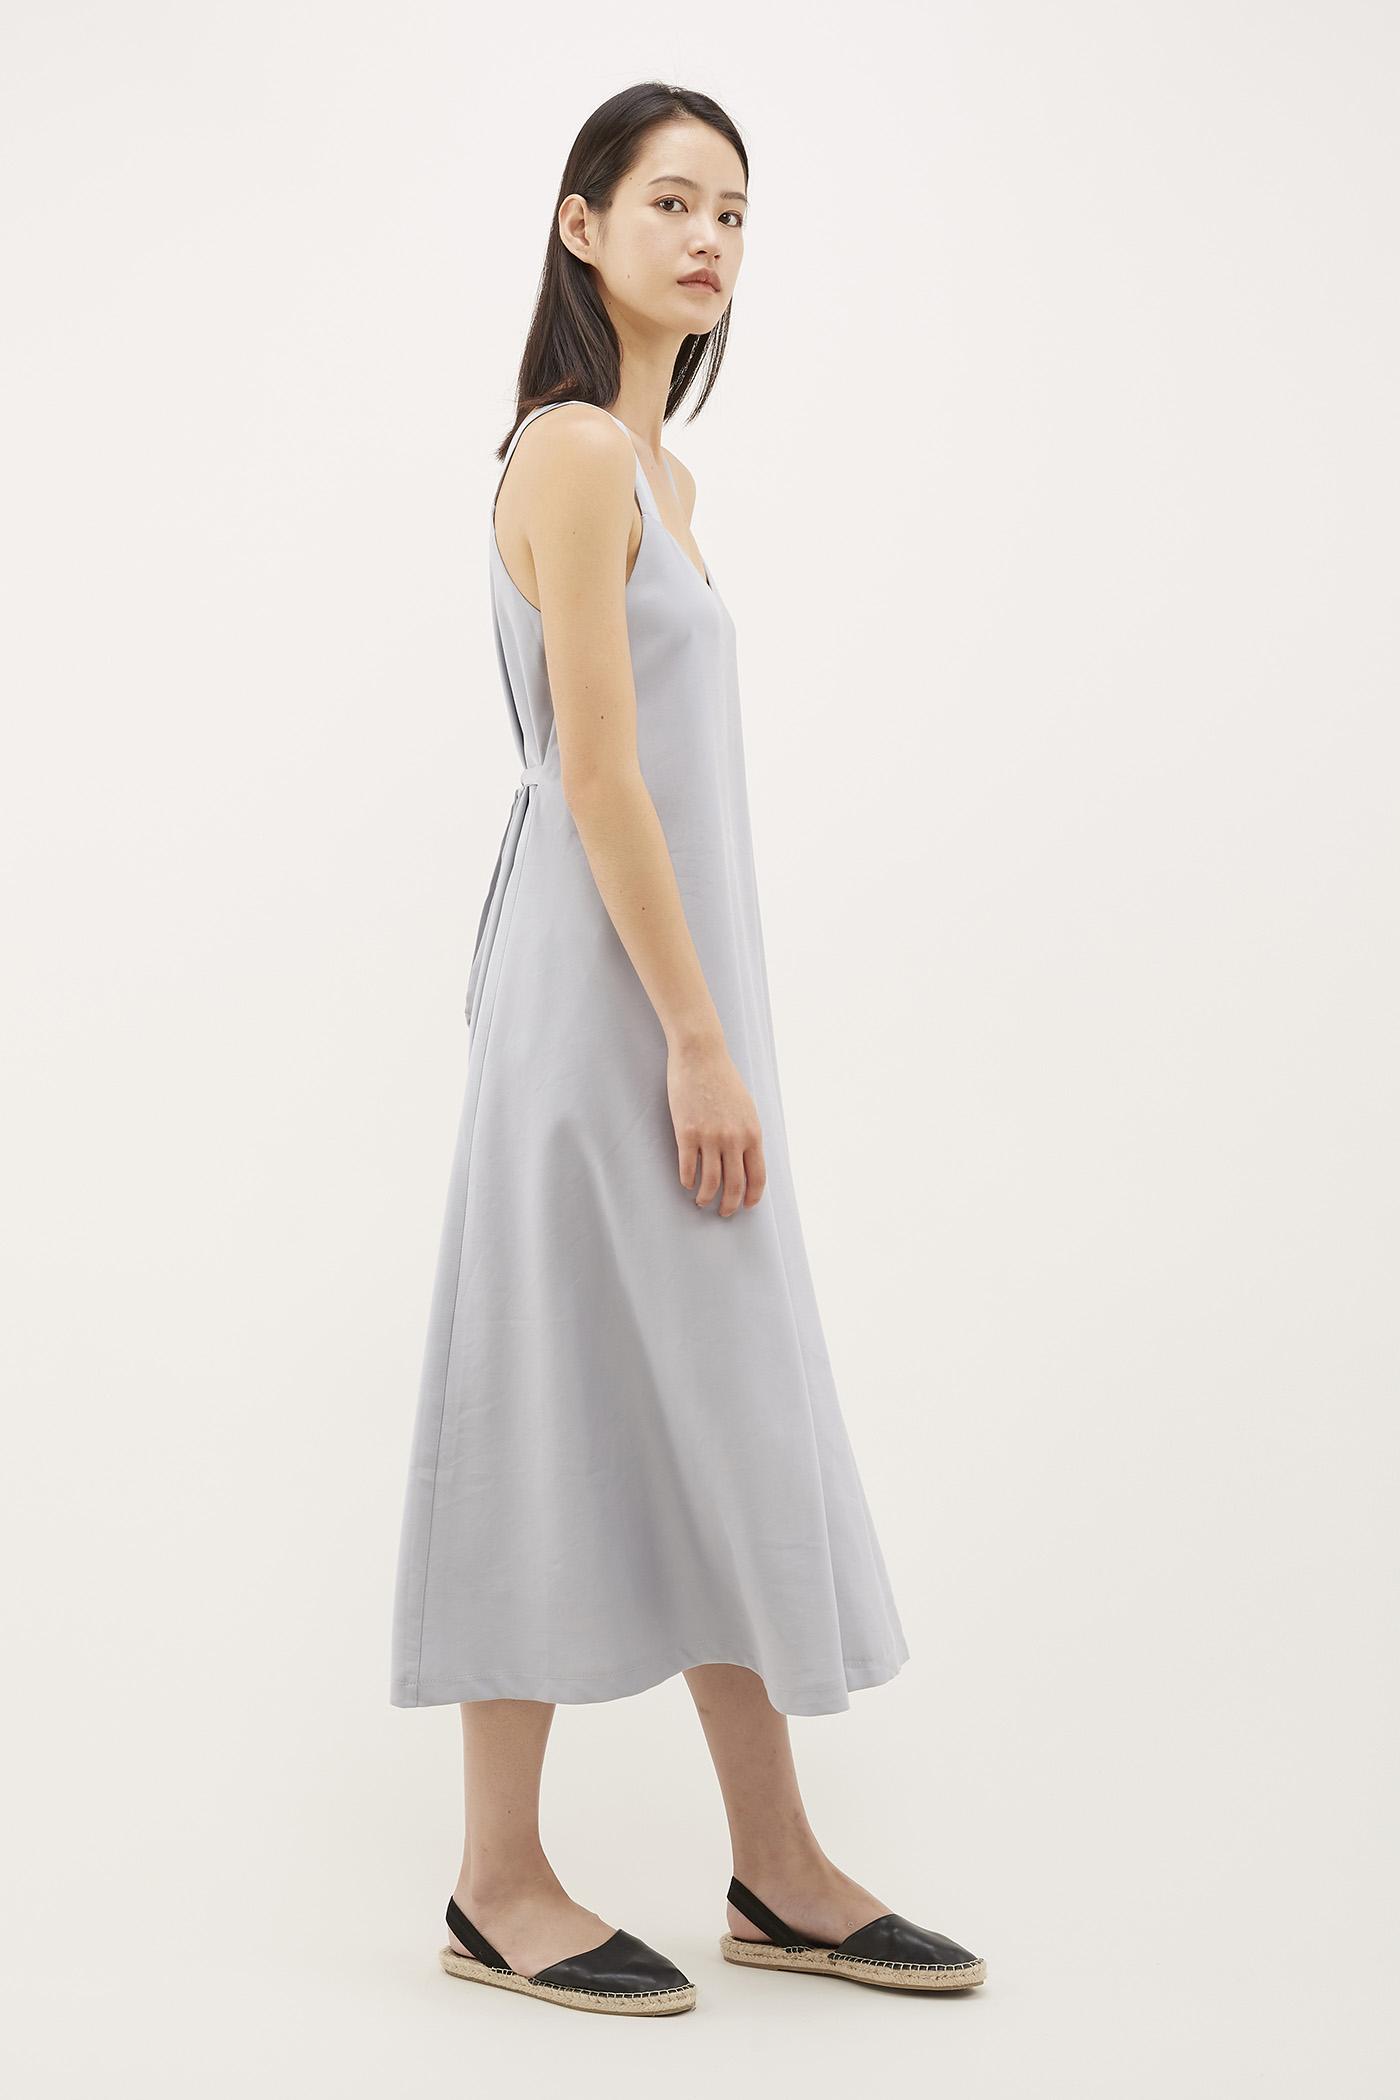 Alicia Swing Dress